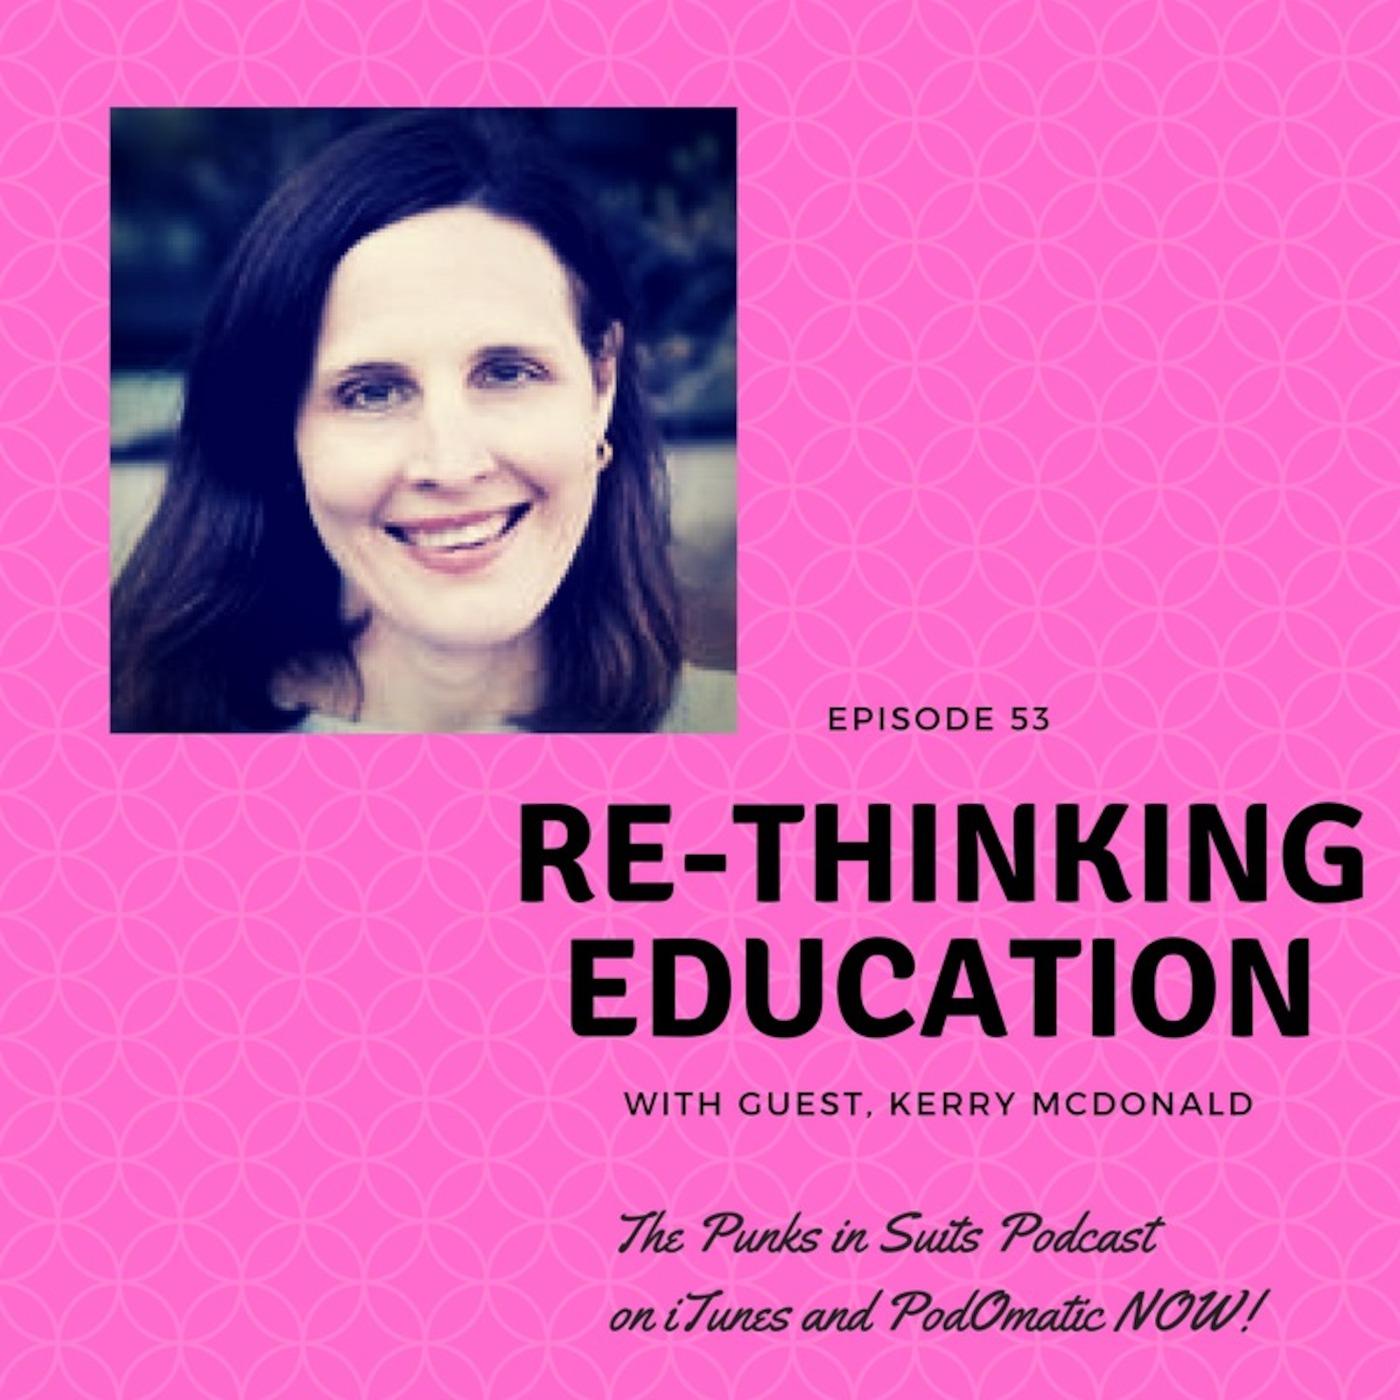 Episode 53: Re-Thinking Education